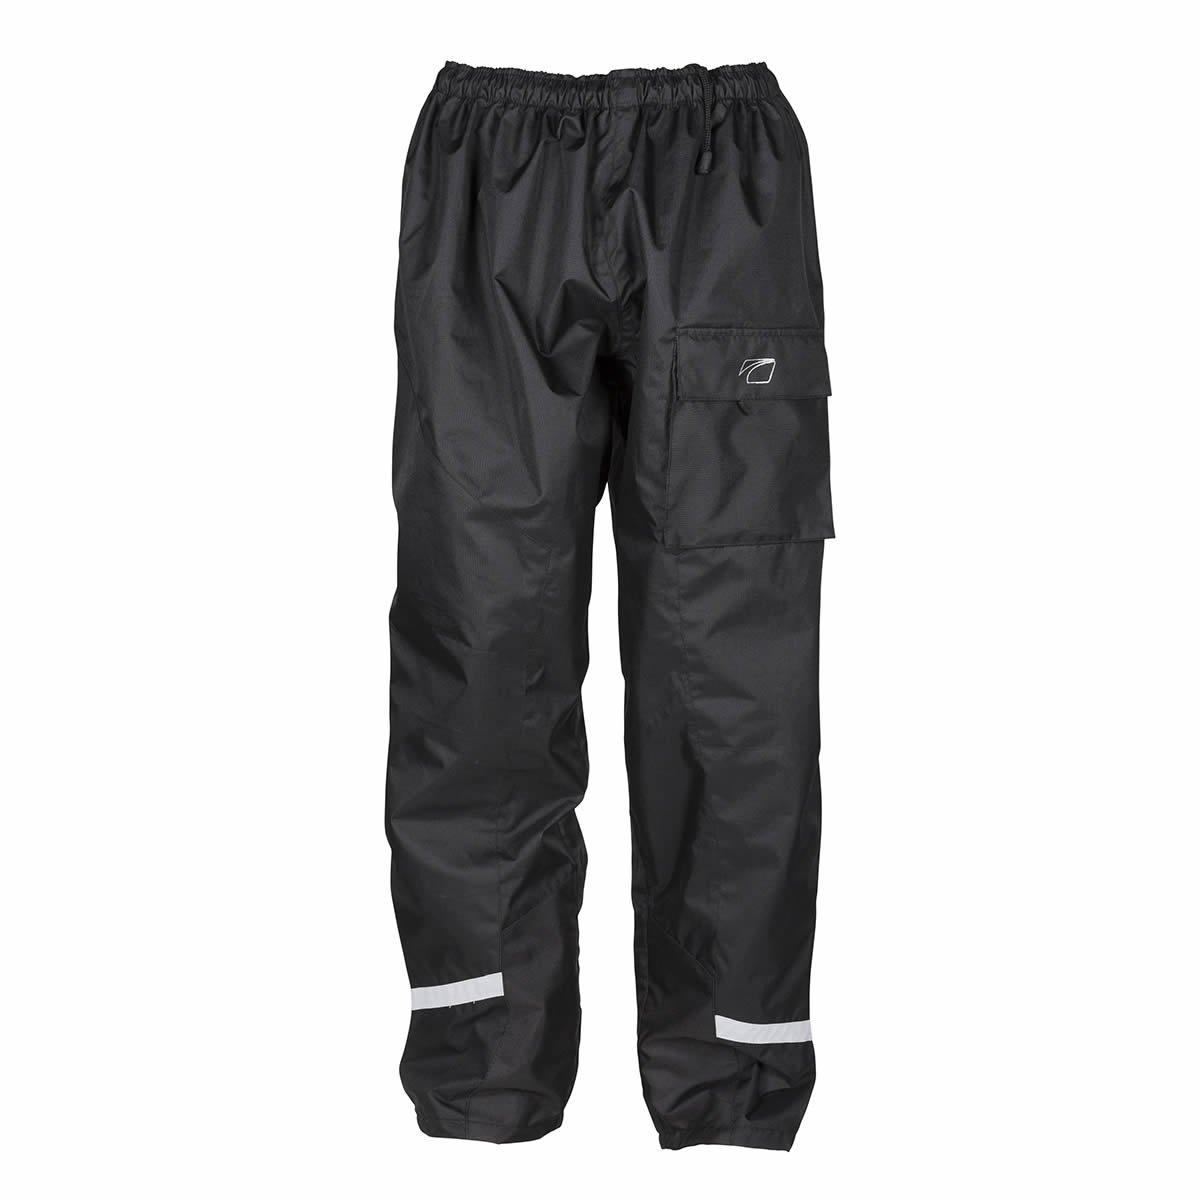 Spada Motorcycle Textile Aqua Trousers Black/Flo 0739178